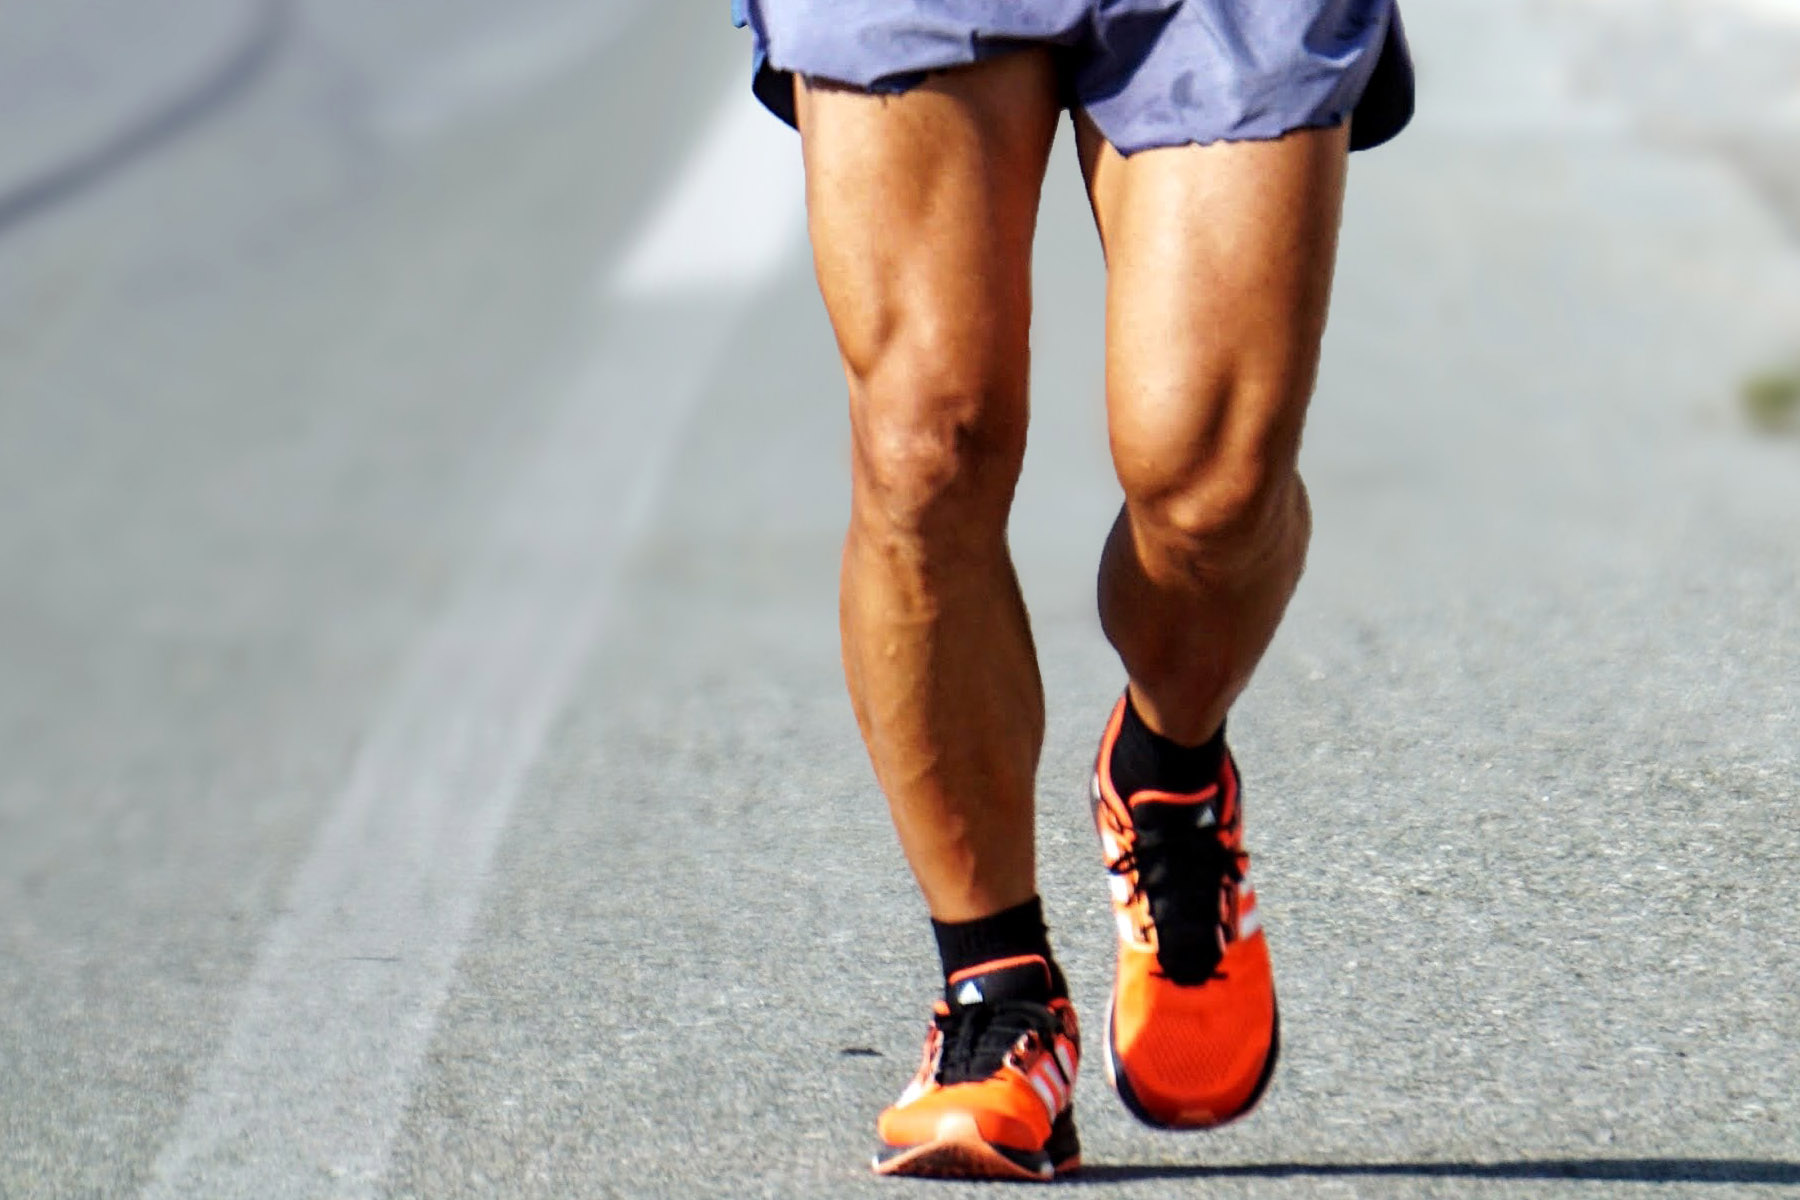 sports knee injury treatment reading